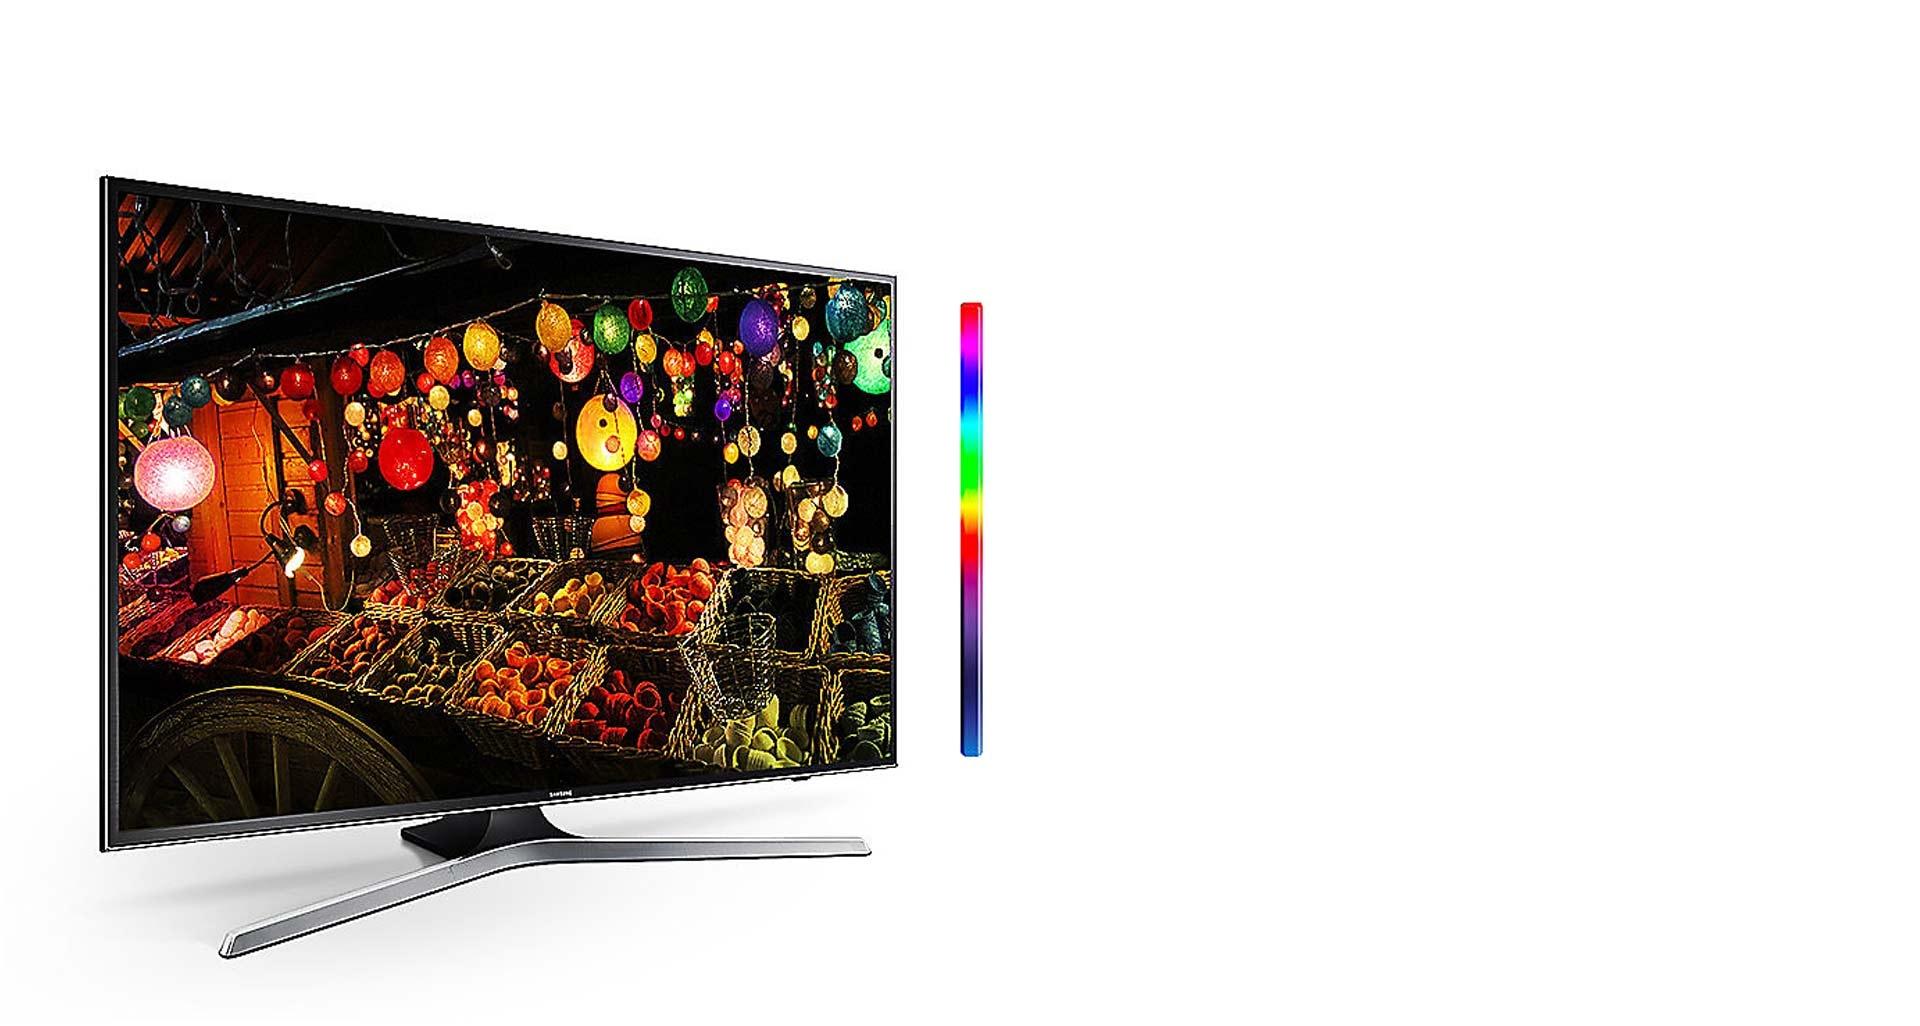 تلویزیون 4K سامسونگ با رنگ تصویر فوق العاده